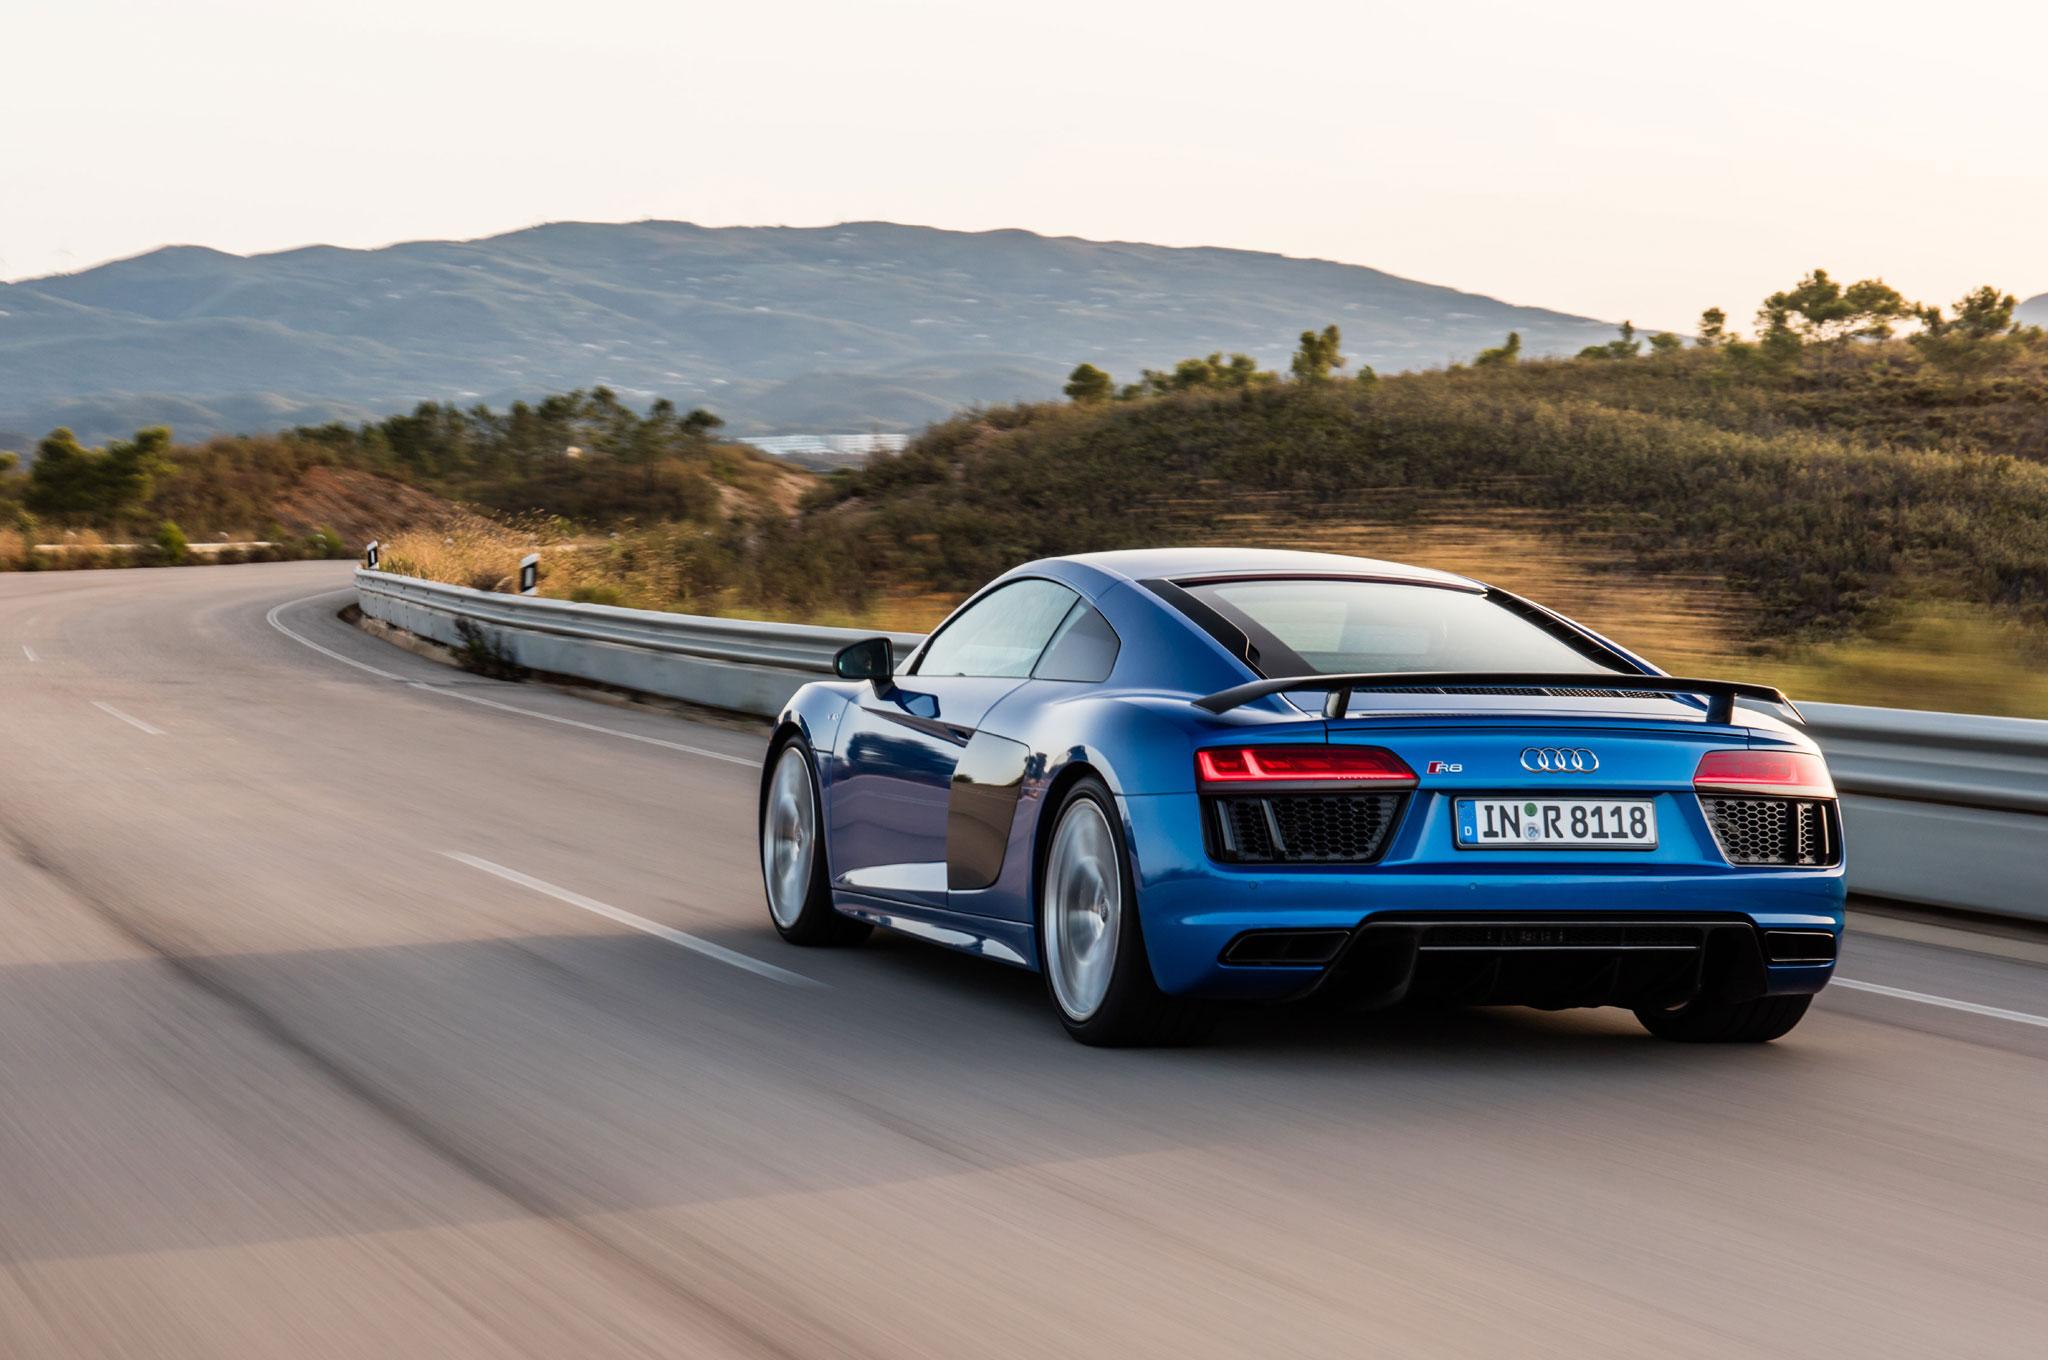 Exceptional 2017 Audi R8 V10 Plus Rear Three Quarter In Motion 01